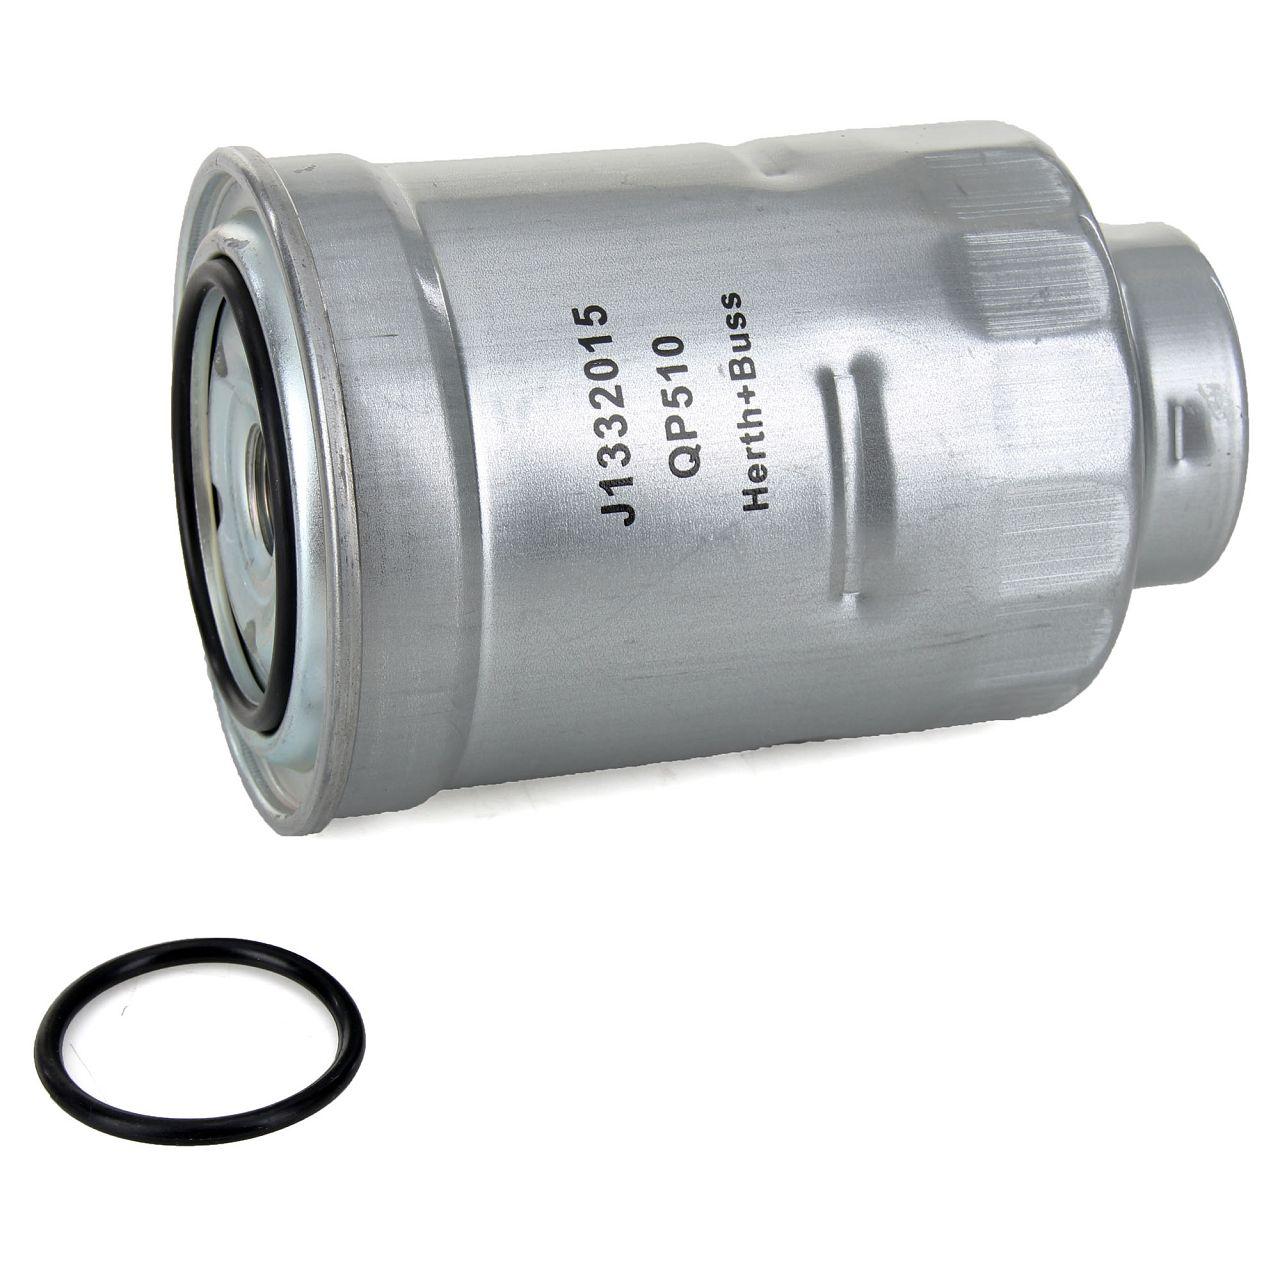 HERTH+BUSS JAKOPARTS Filterpaket Filterset für TOYOTA AVENSIS (T25) 2.0 D-4D